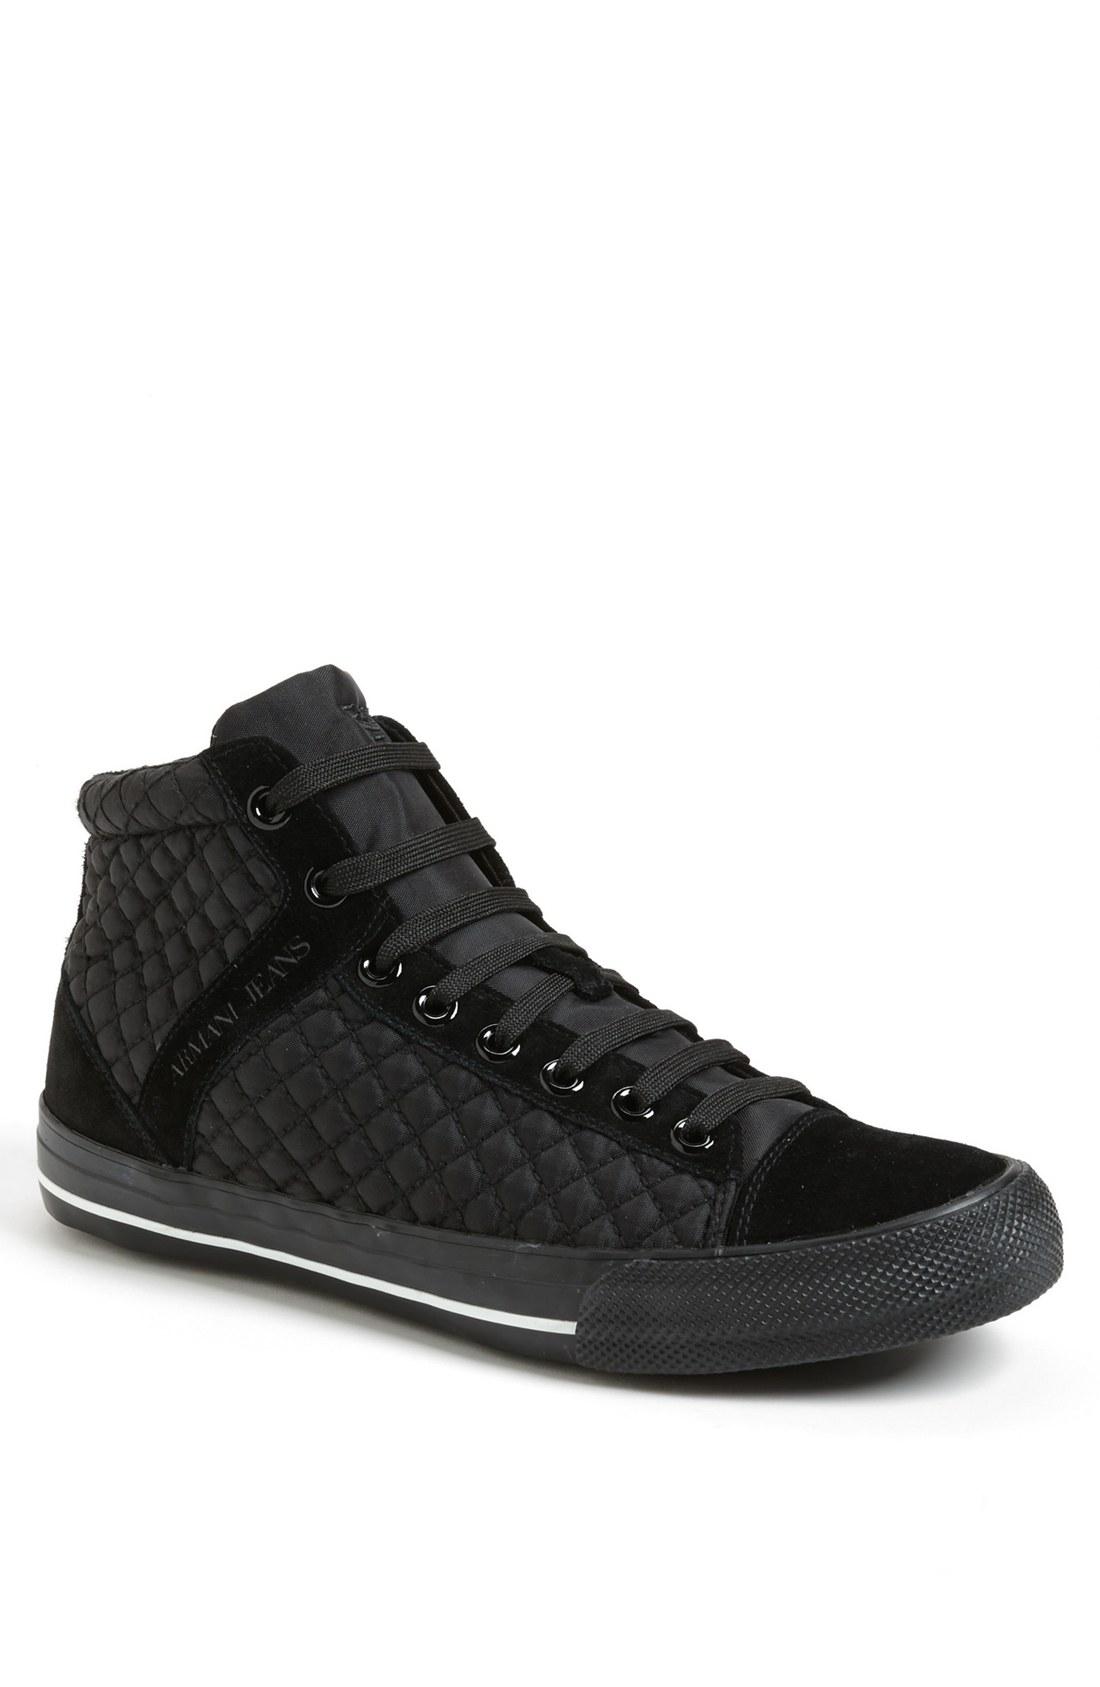 armani jeans quilted sneaker in black for men lyst. Black Bedroom Furniture Sets. Home Design Ideas